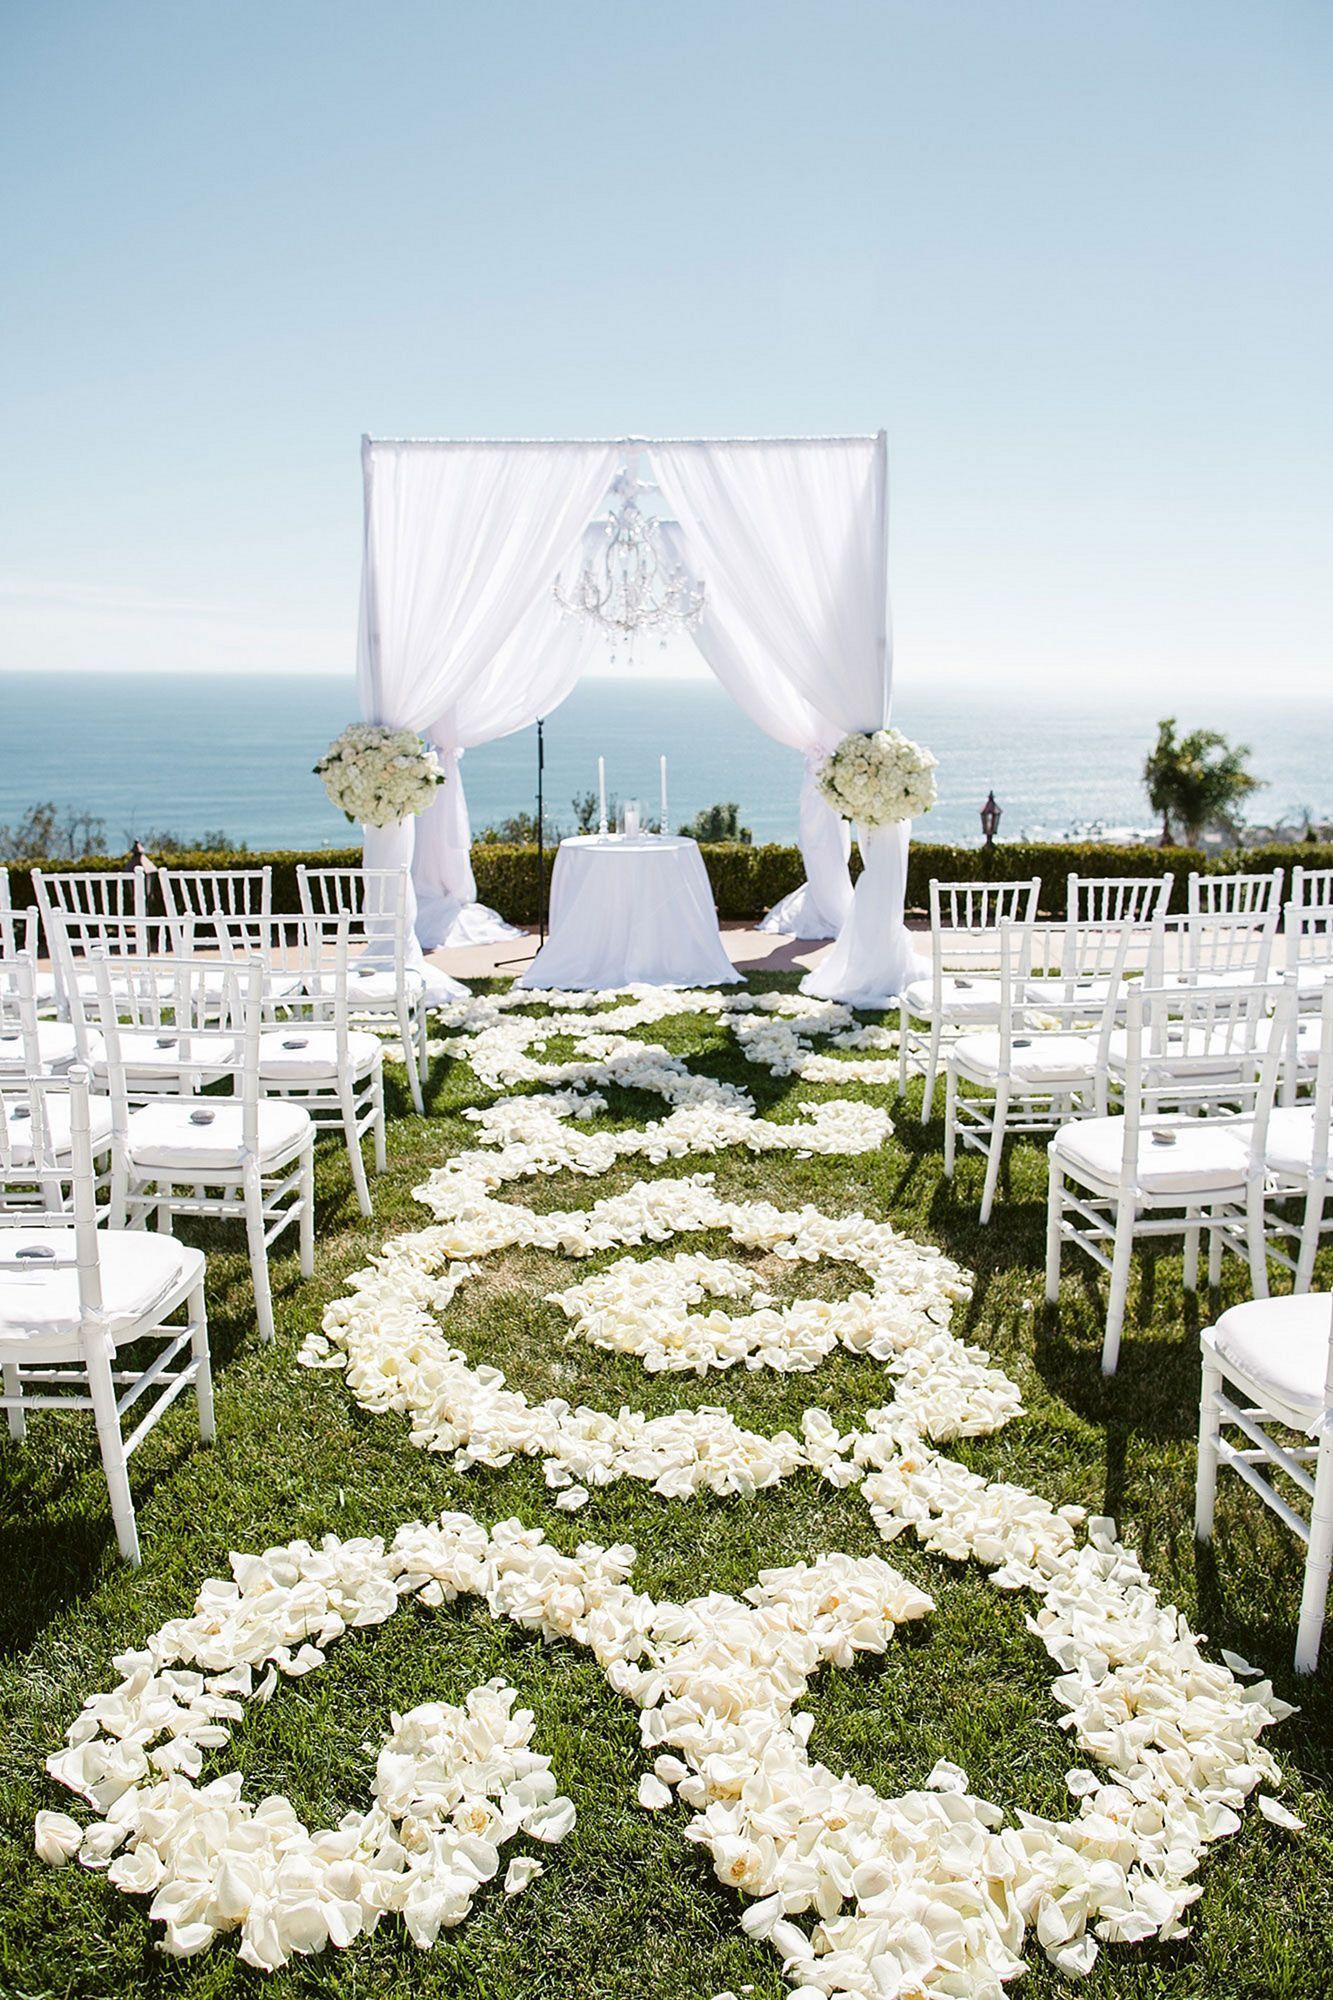 White wedding decor ideas   Most Popular White Wedding Decoration Ideas For Your Elegant